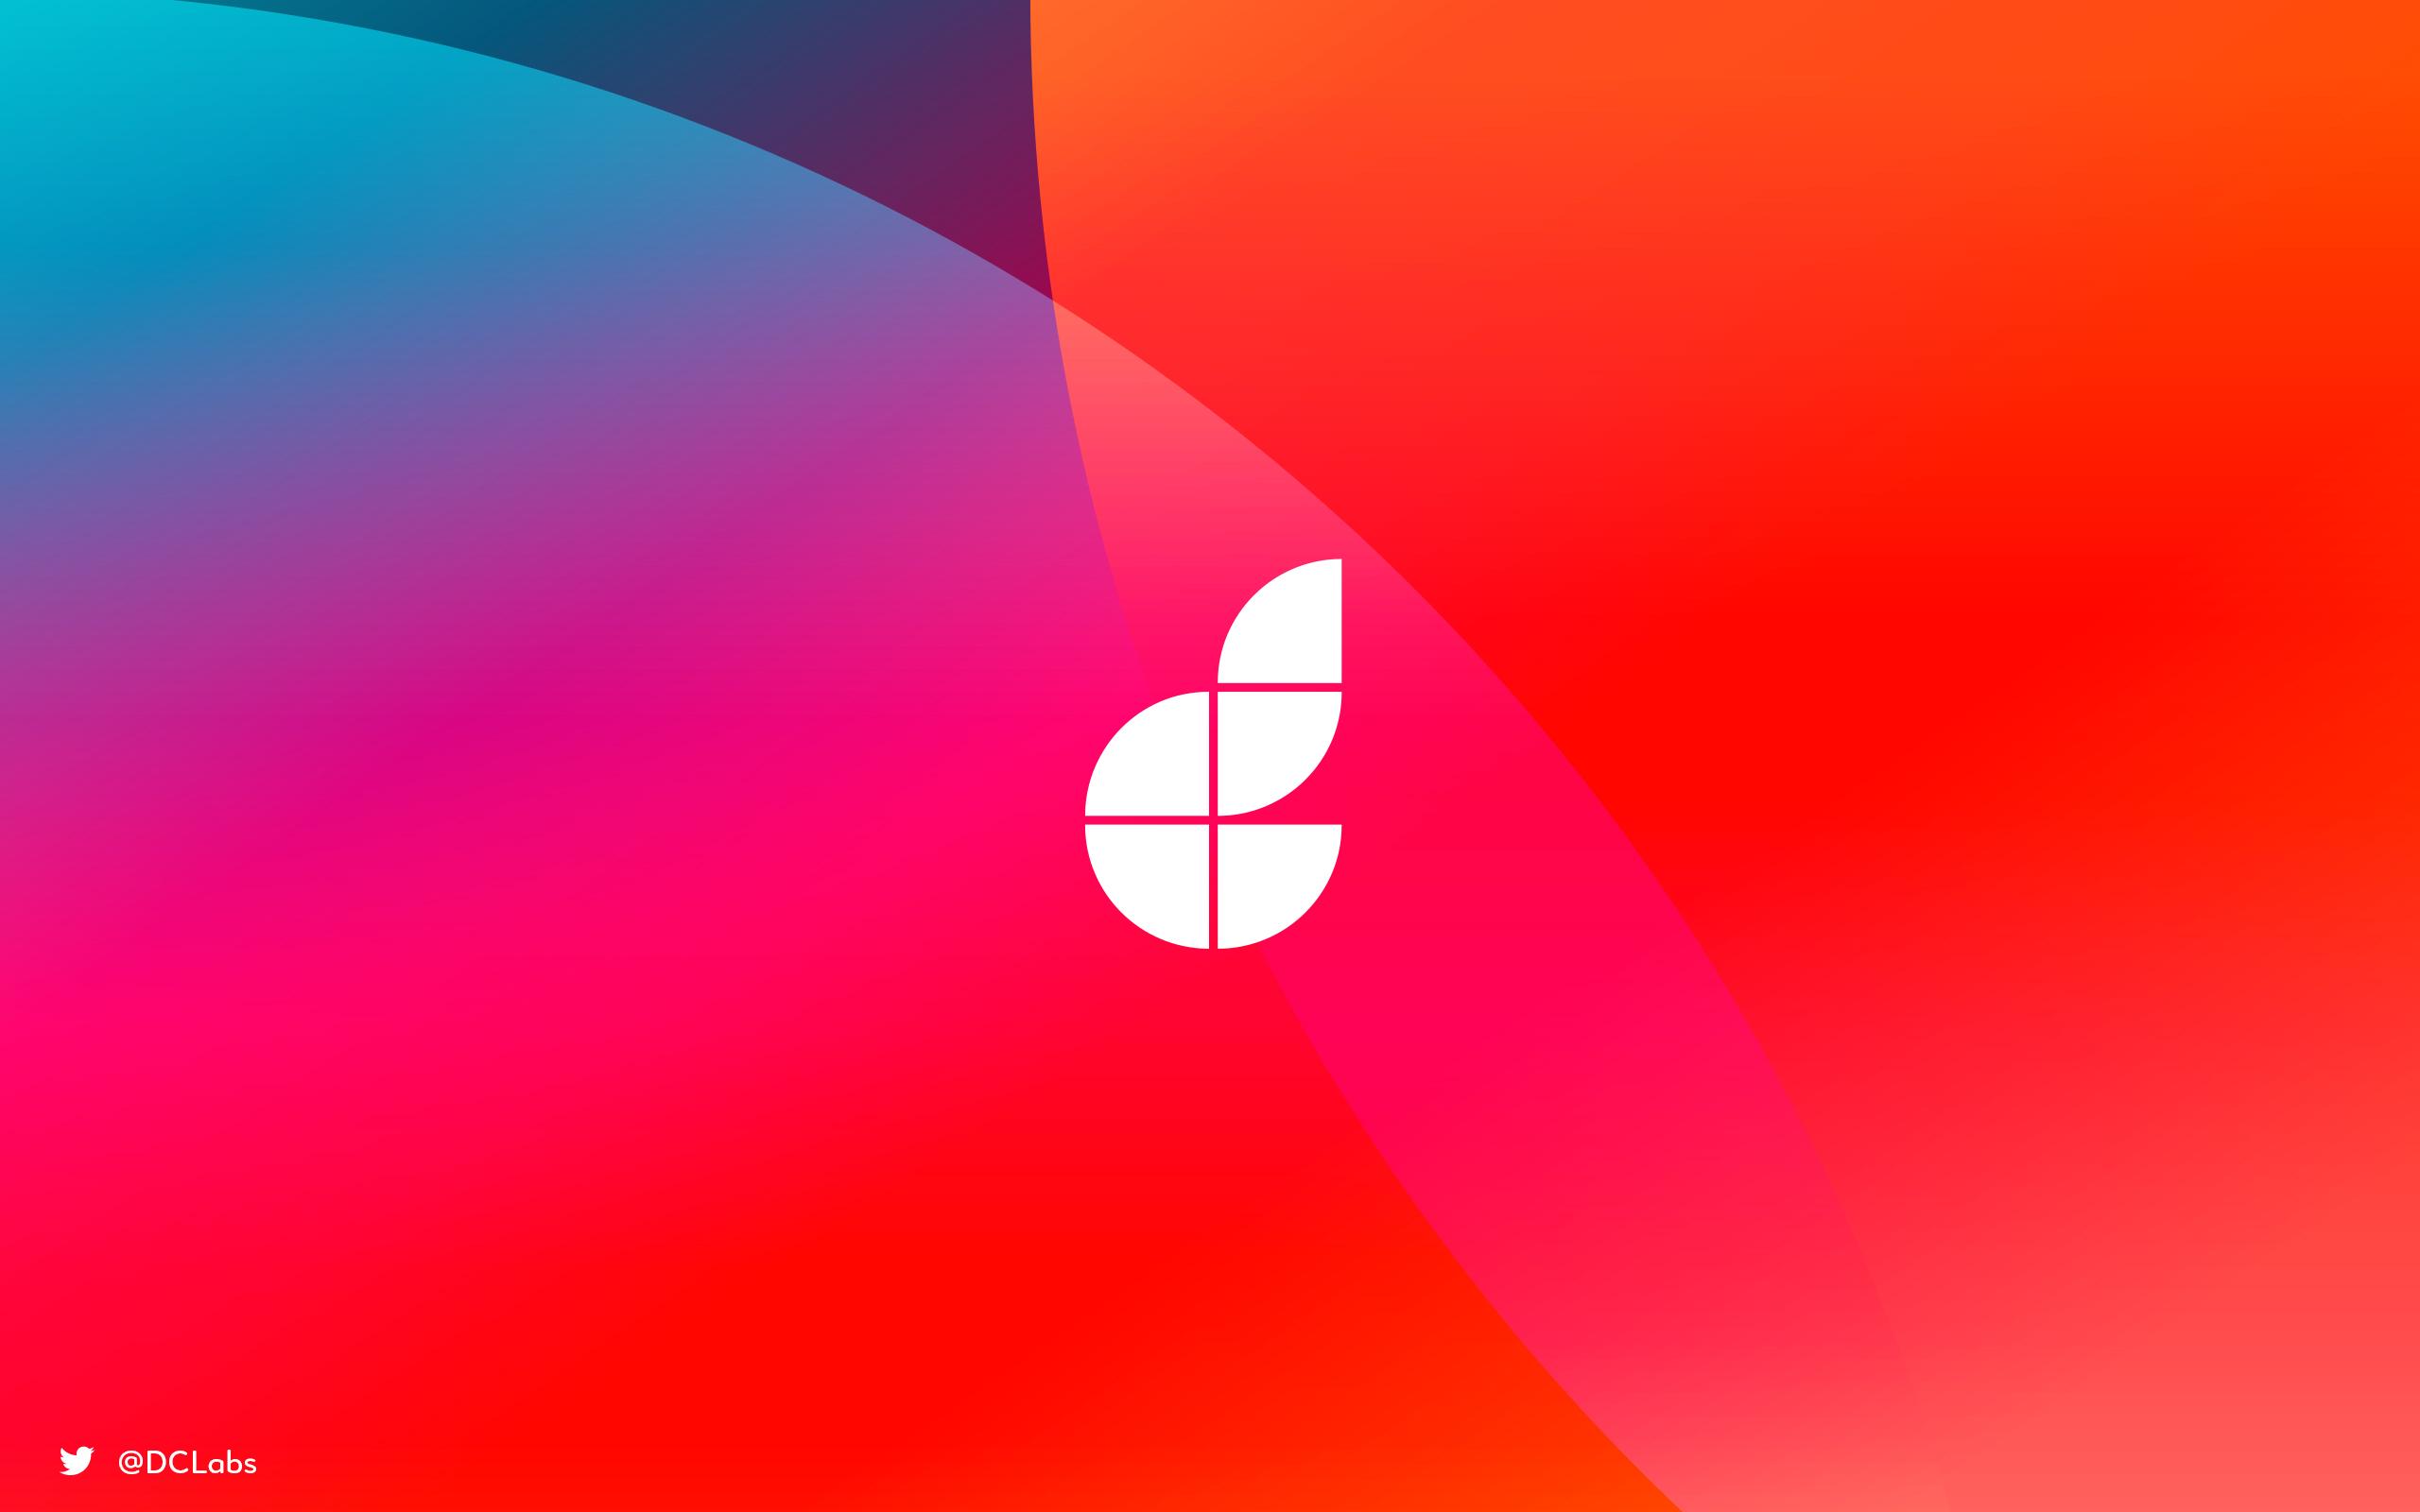 Digital Creativity Labs logo